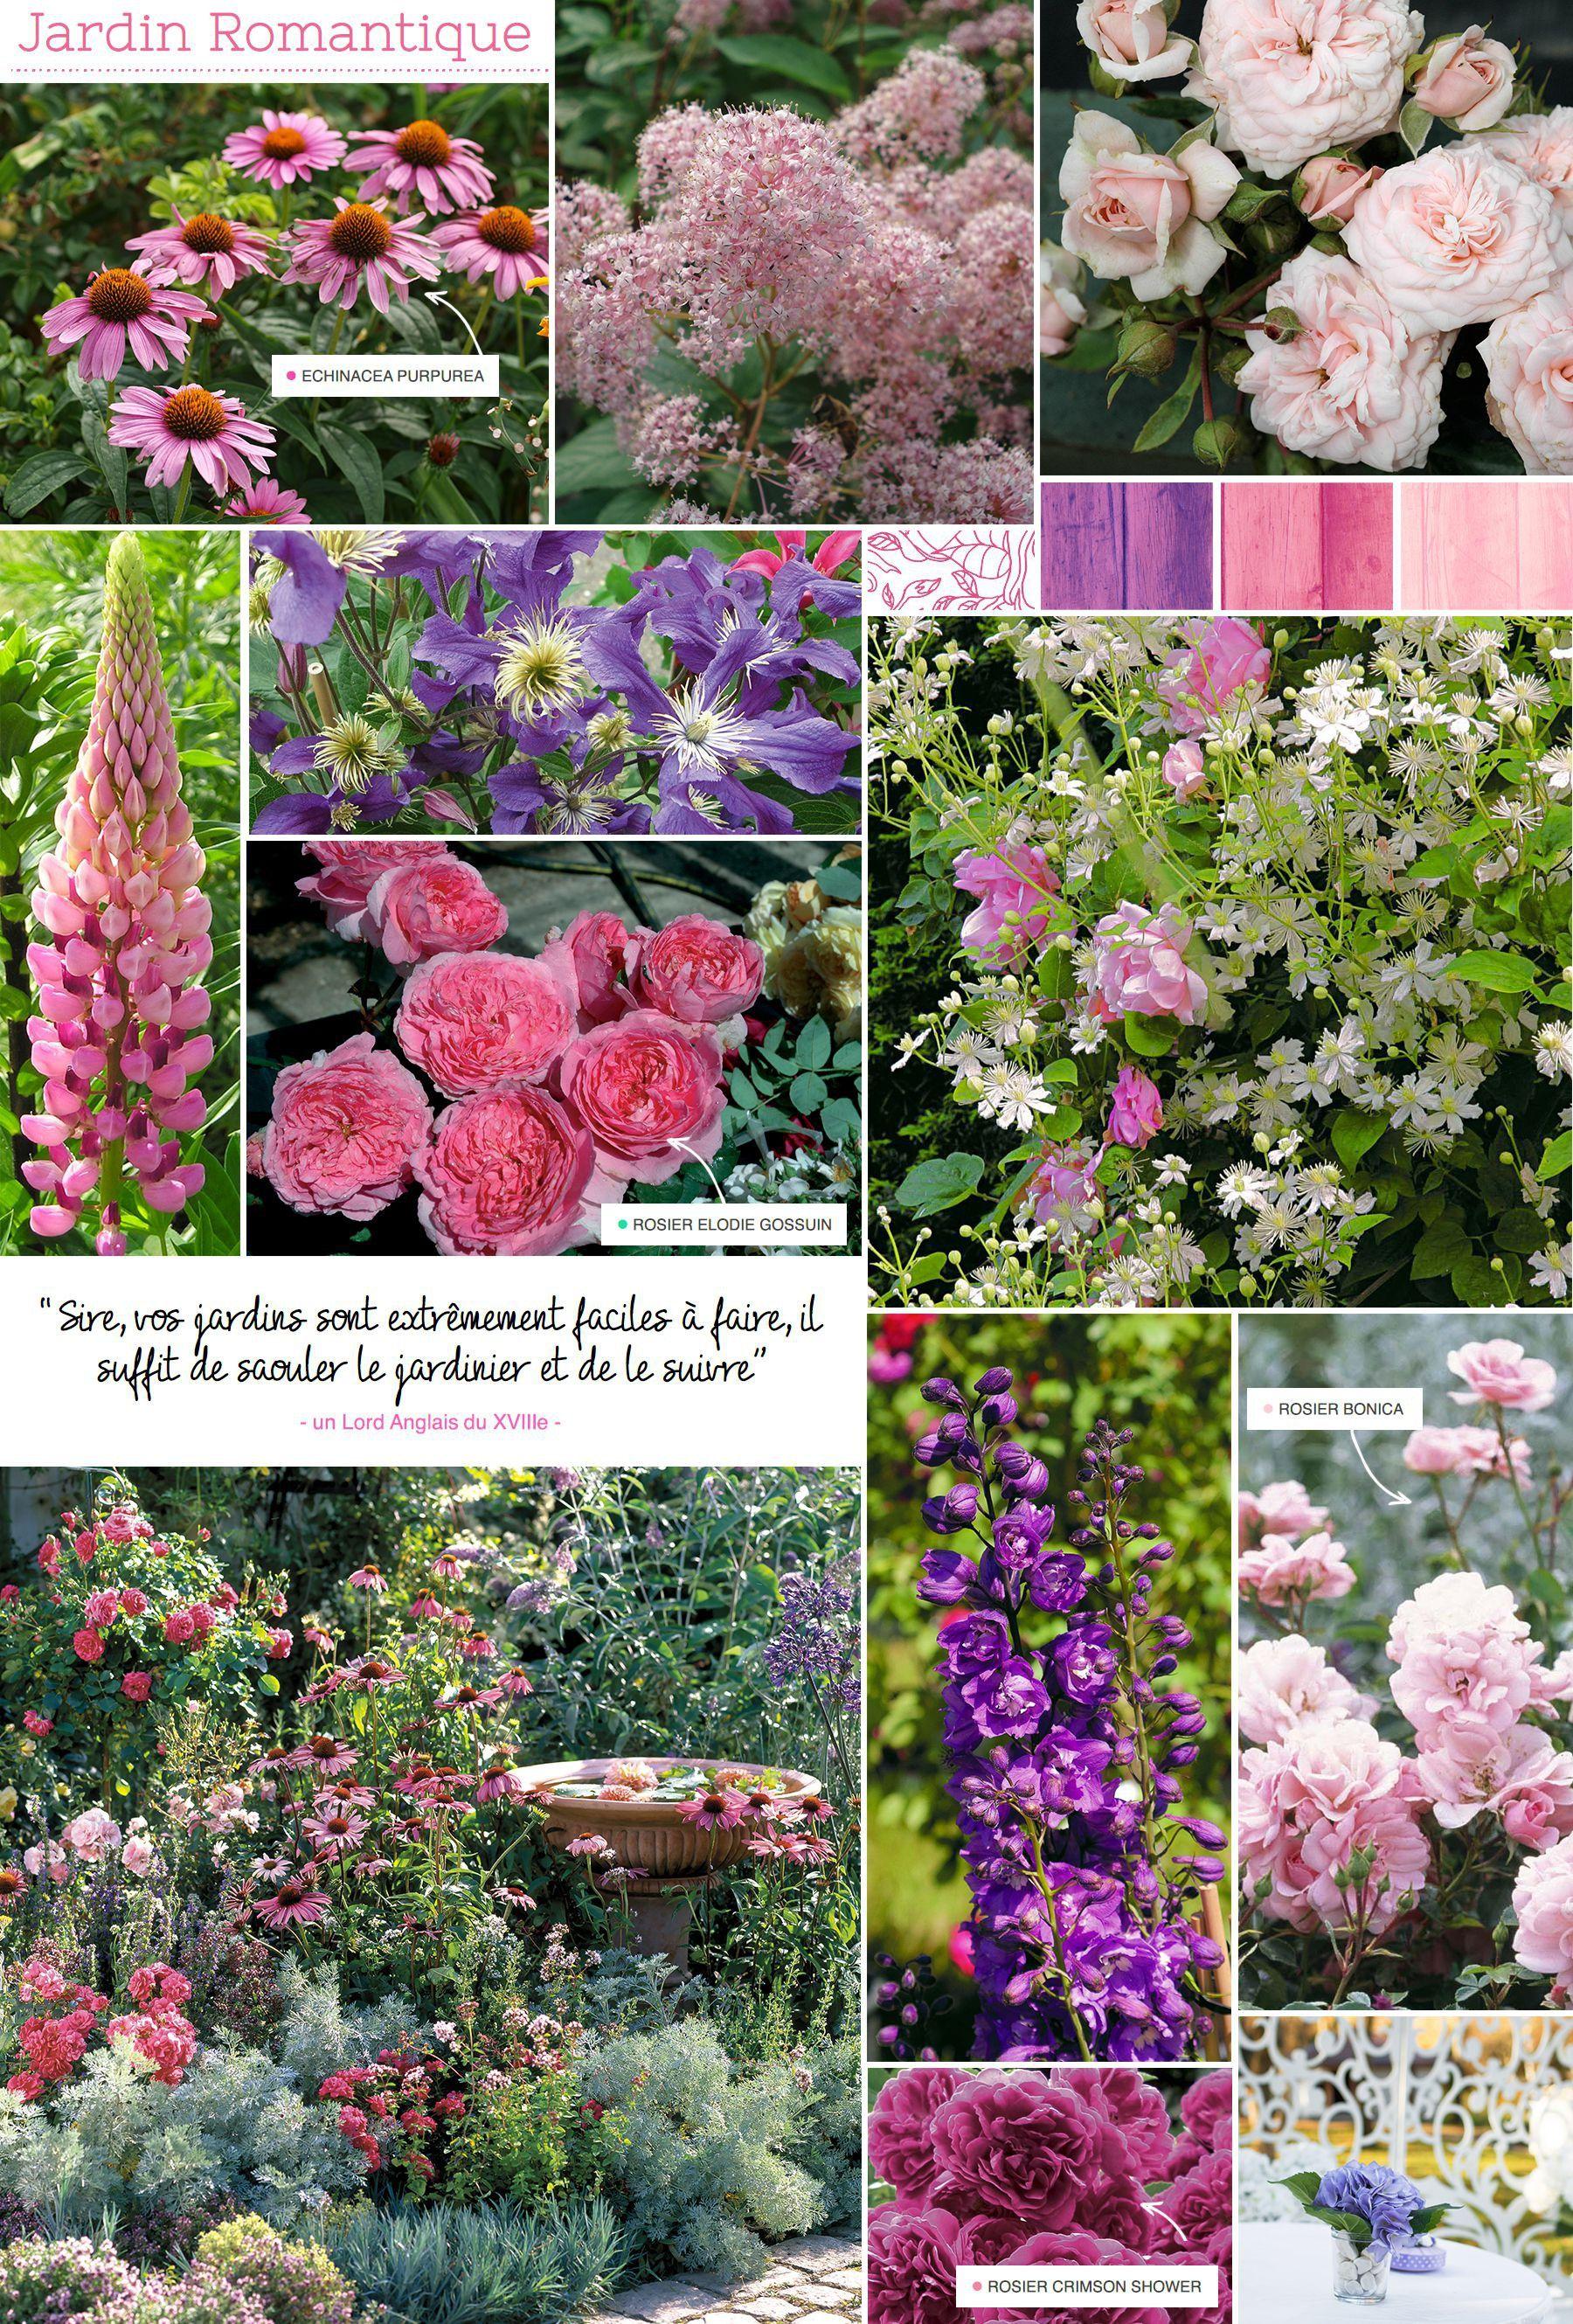 Jardin Romantique | Maison | Jardin romantique, Plante jardin et Jardins